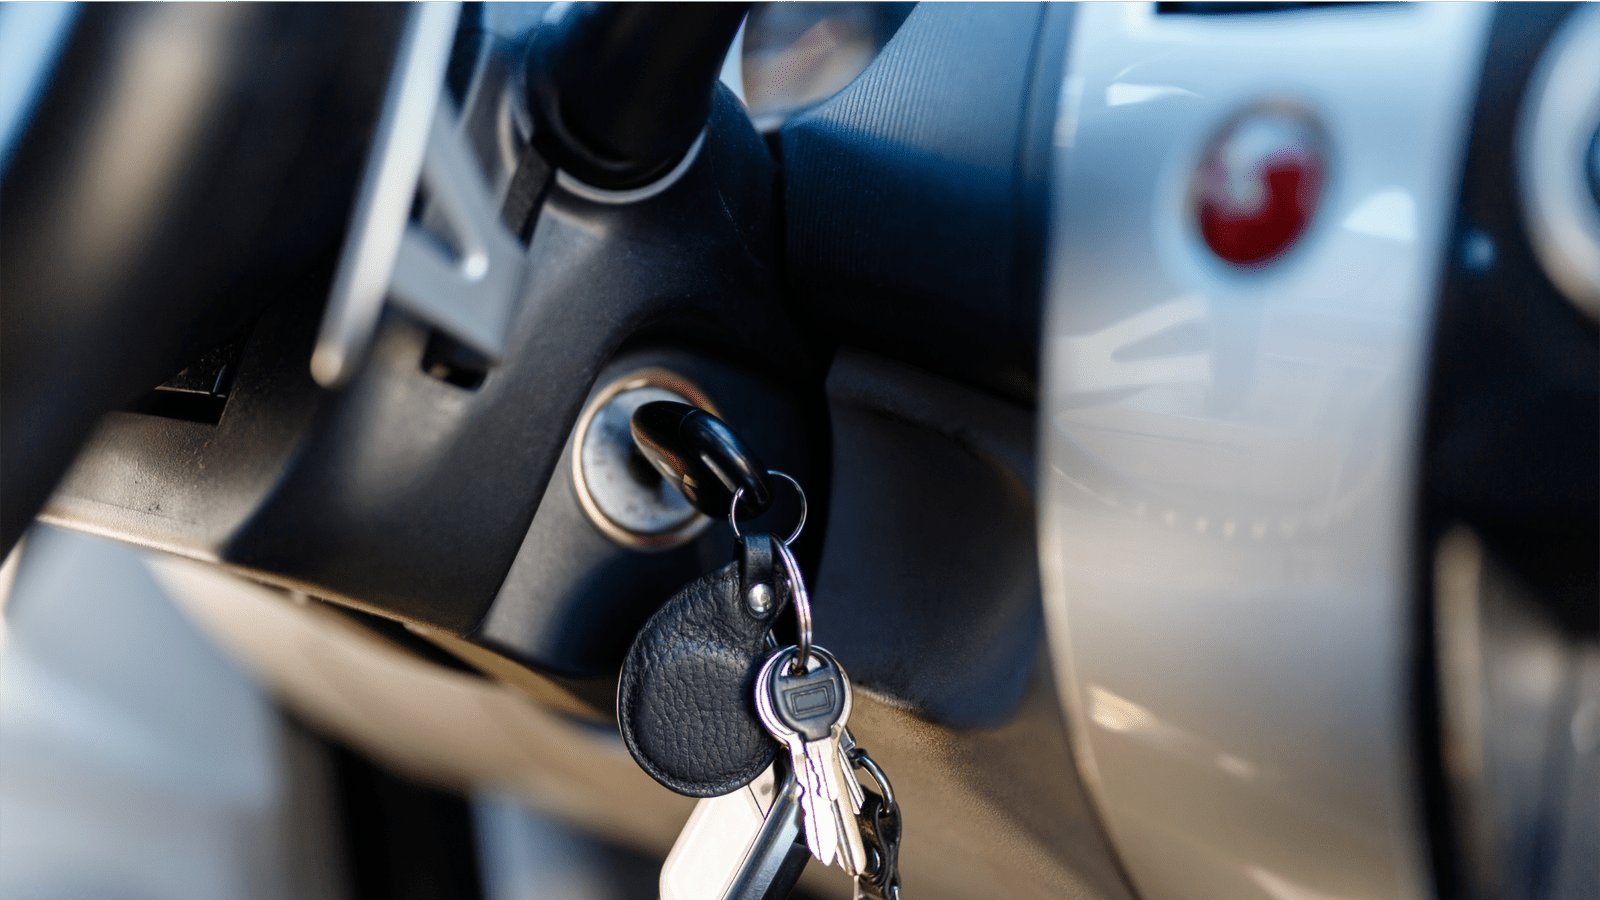 In House Car Loans Garland Used Bhph Cars Garland Tx Bad Credit